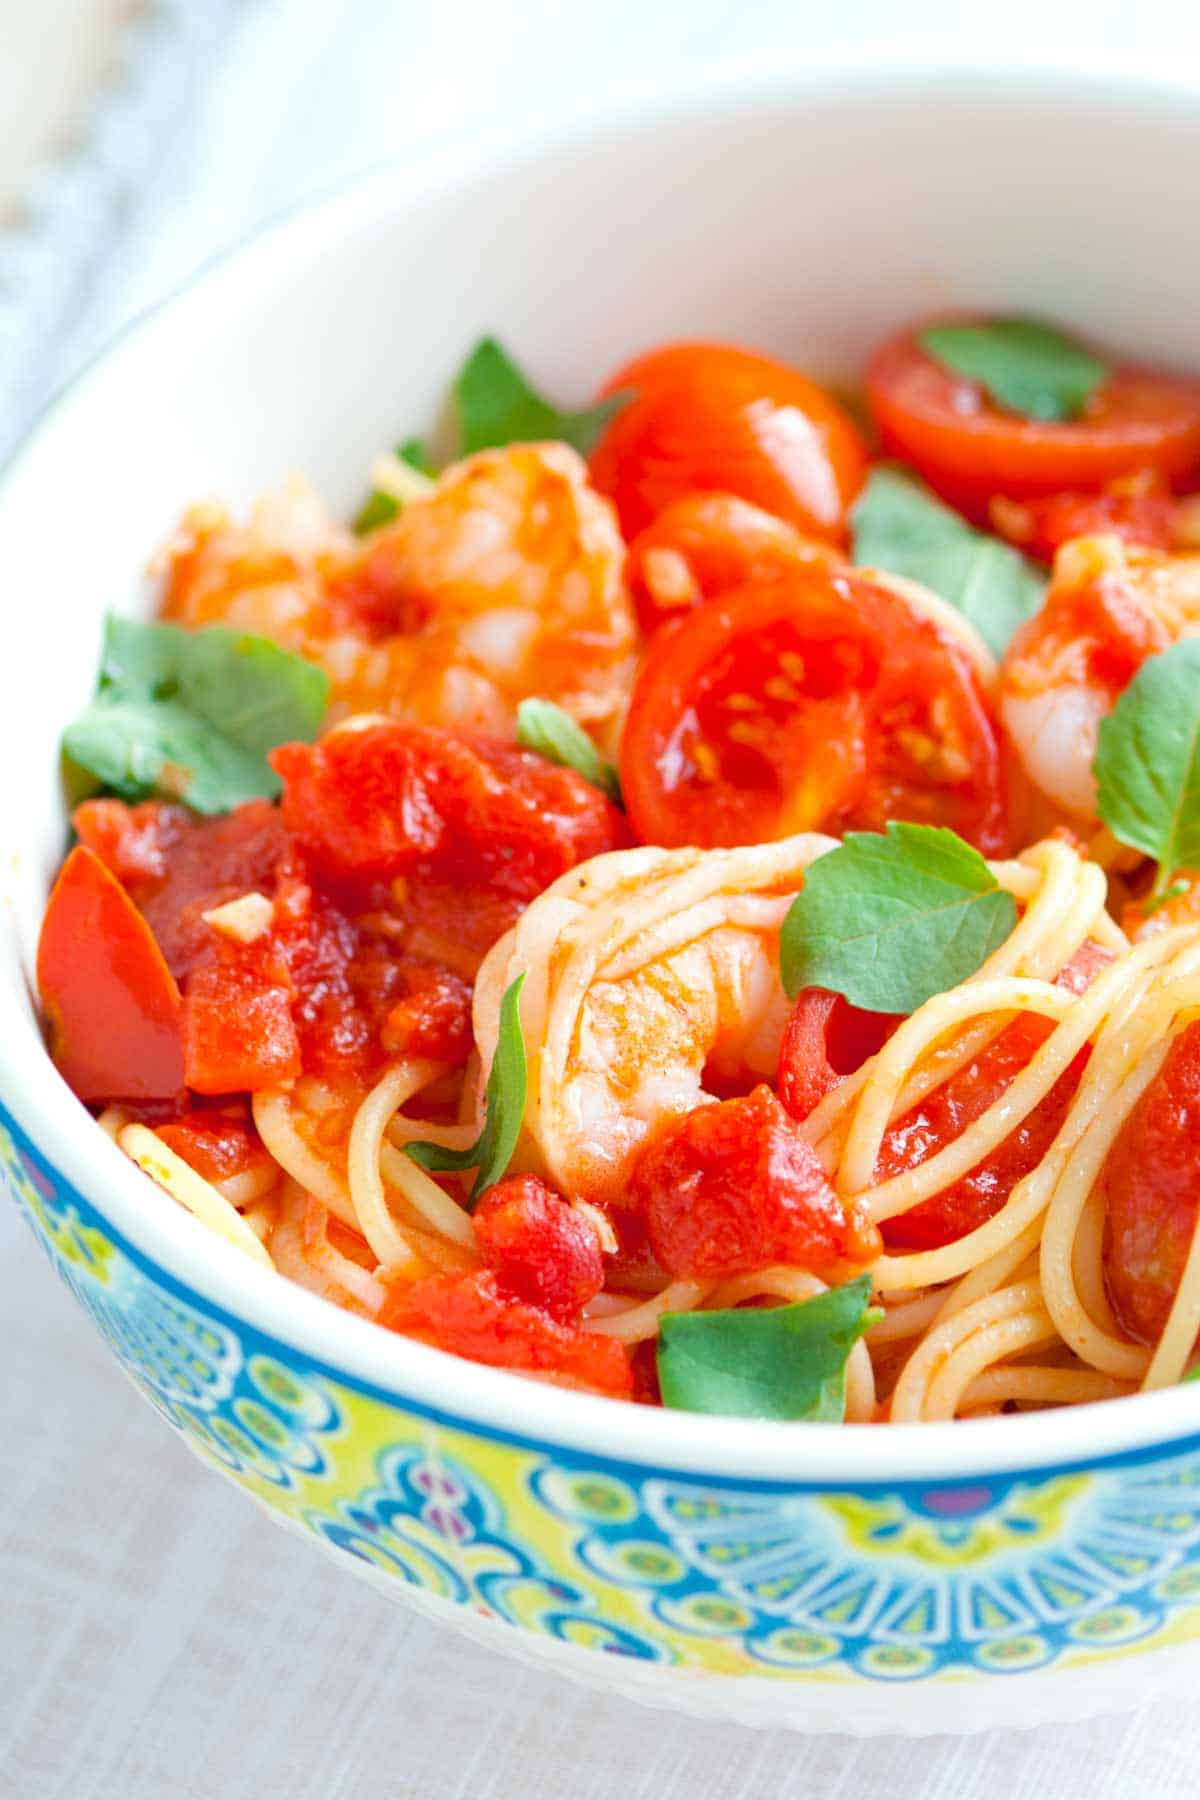 Shrimp Tomato Pasta  15 Minute Shrimp Pasta Recipe with Tomato and Basil